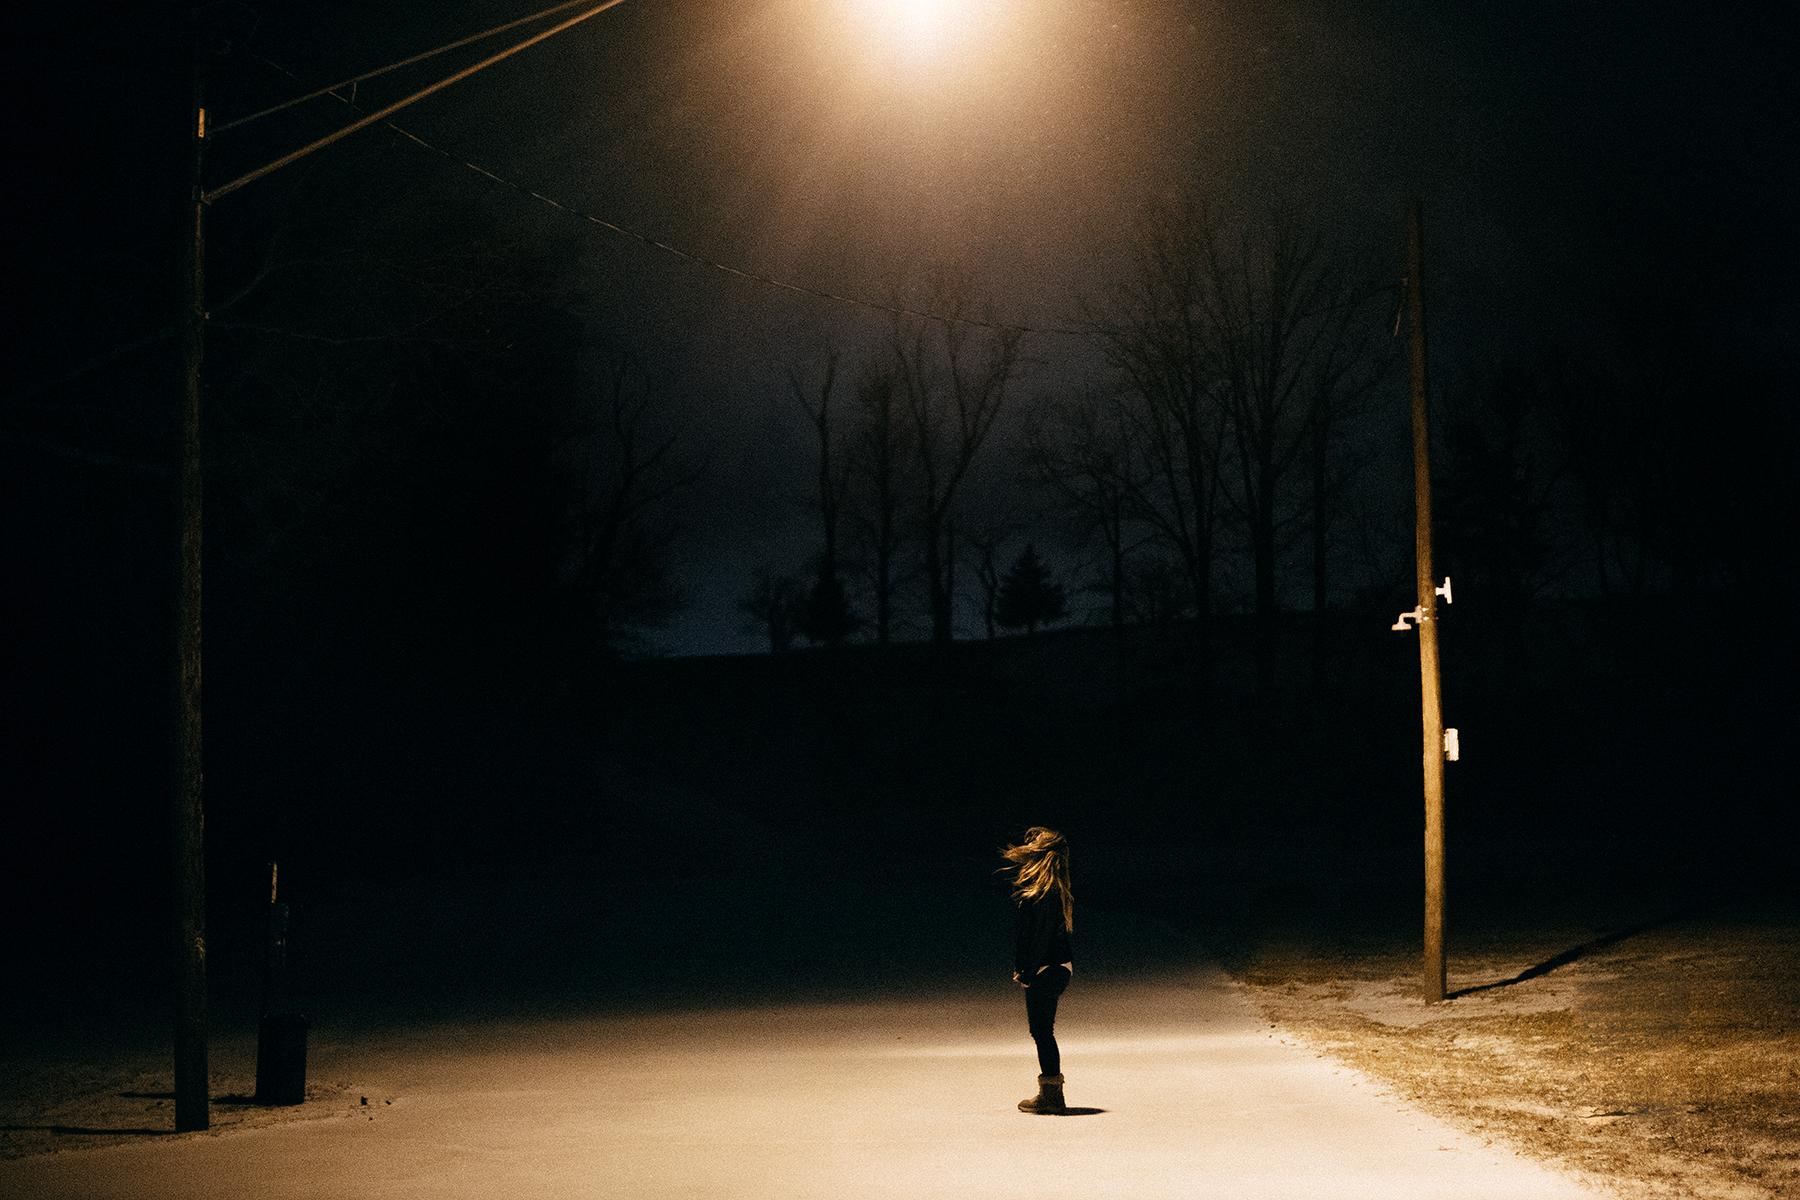 36: I Found My Light